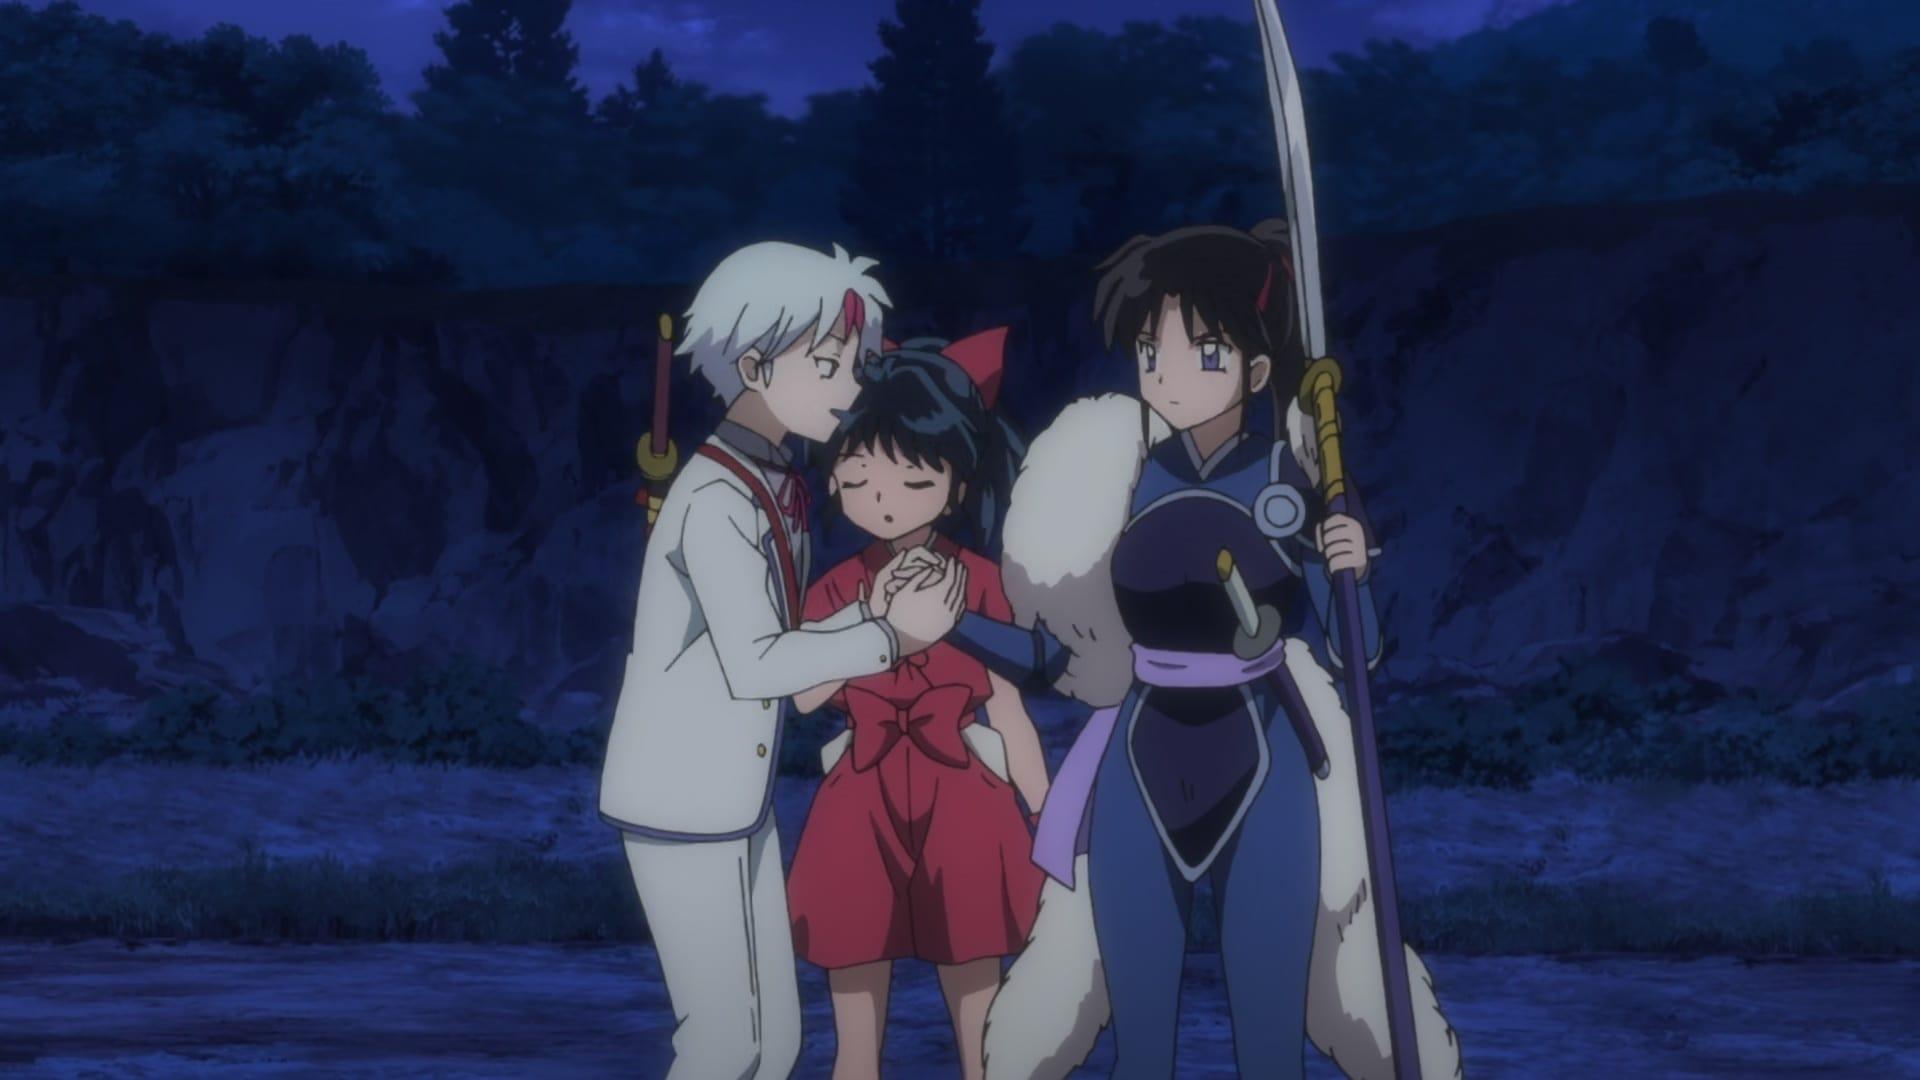 Yashahime: Princess Half-Demon Season 1 :Episode 10  The Gold and Silver Rainbow Pearls